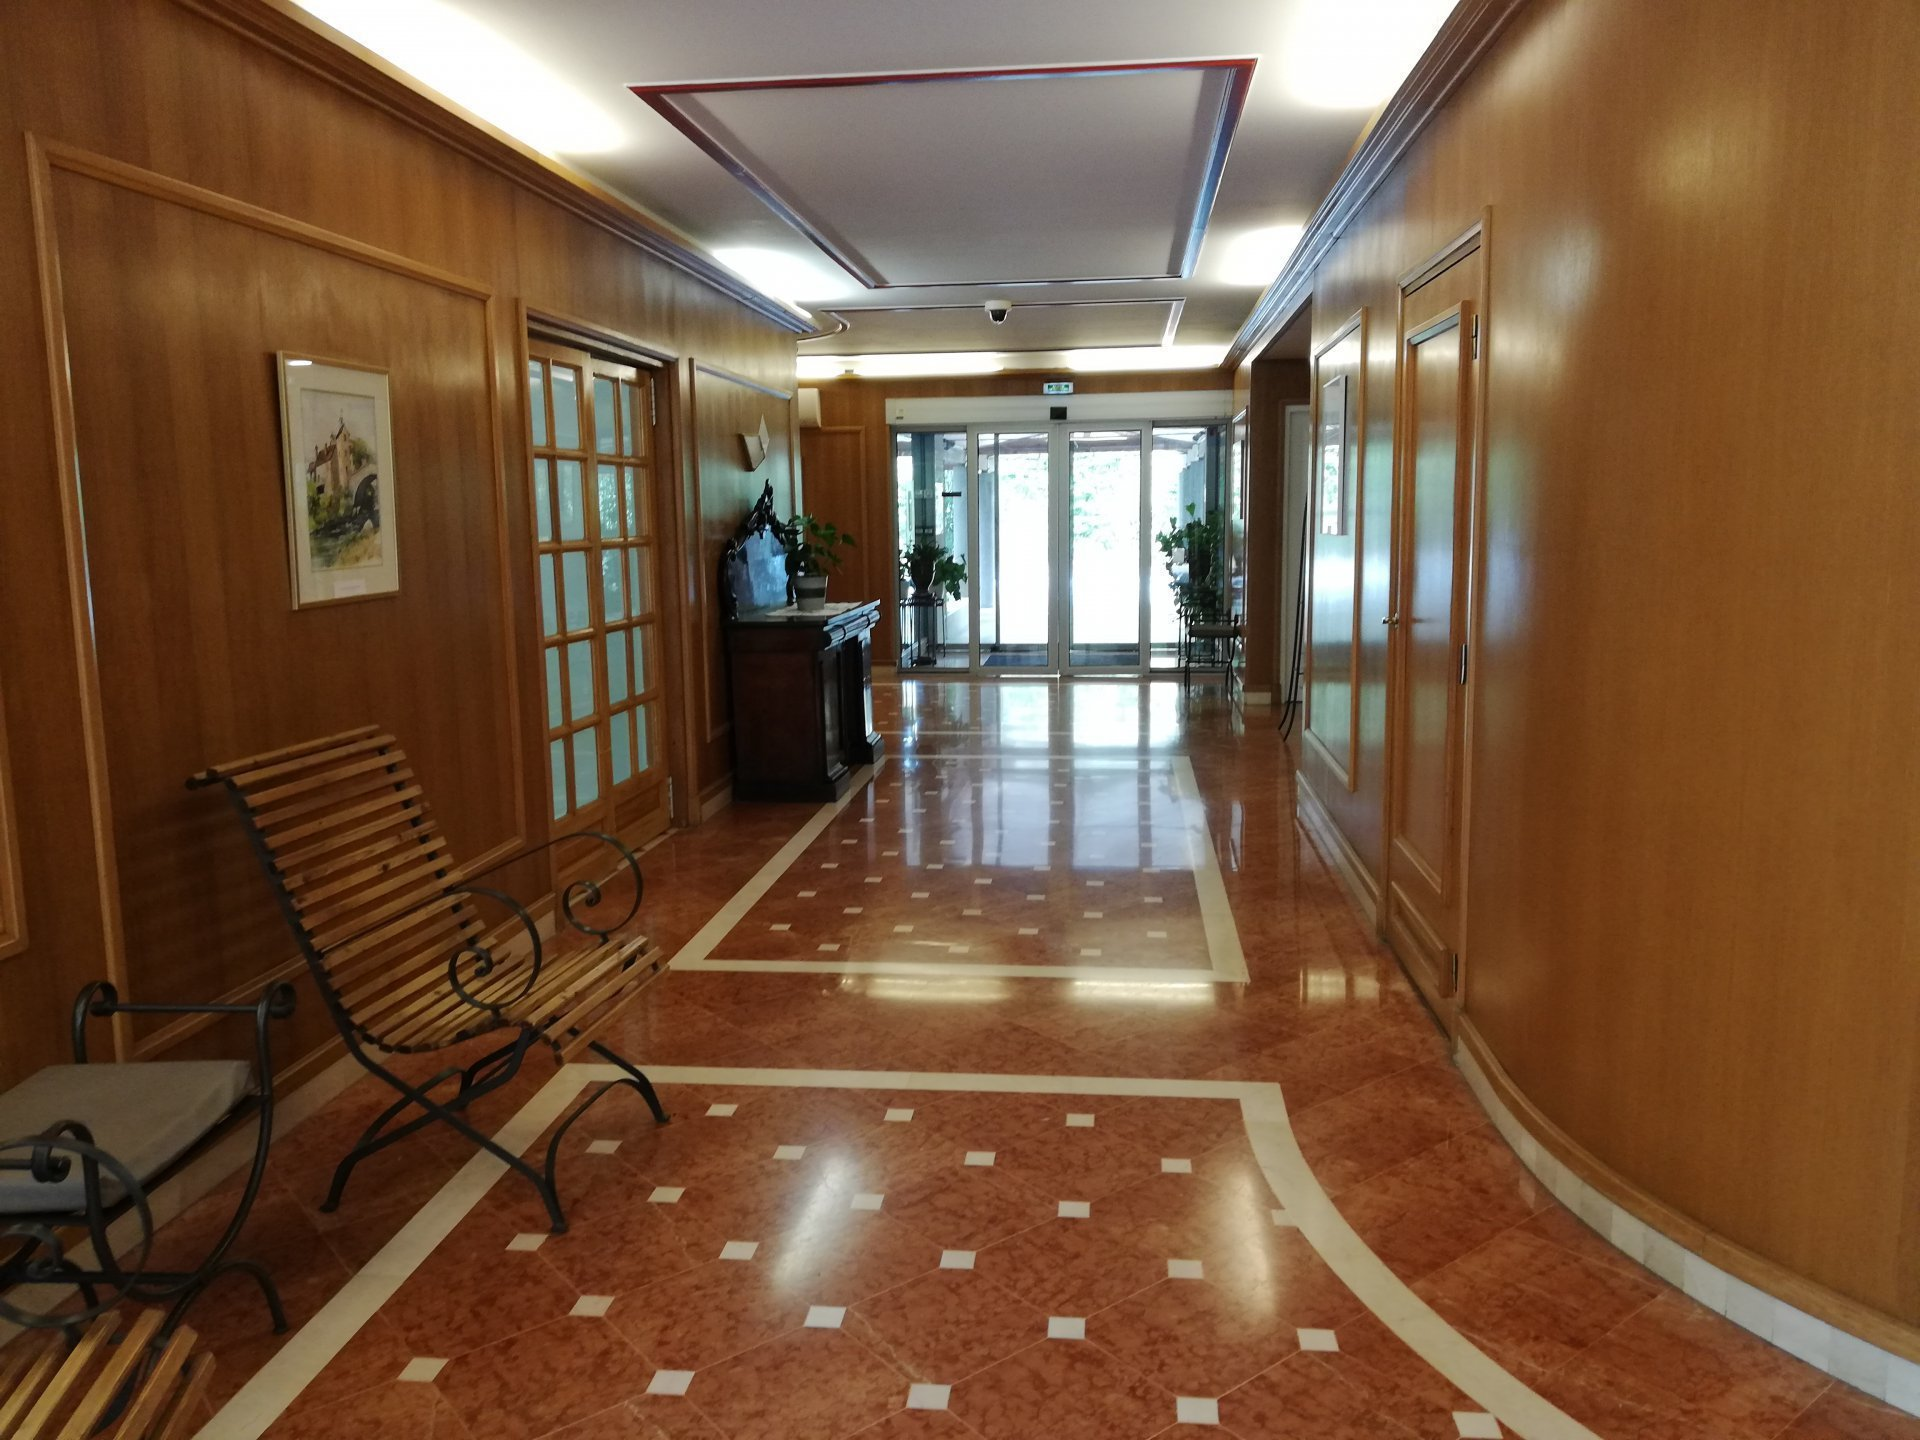 Studio résidence sénior grand confort